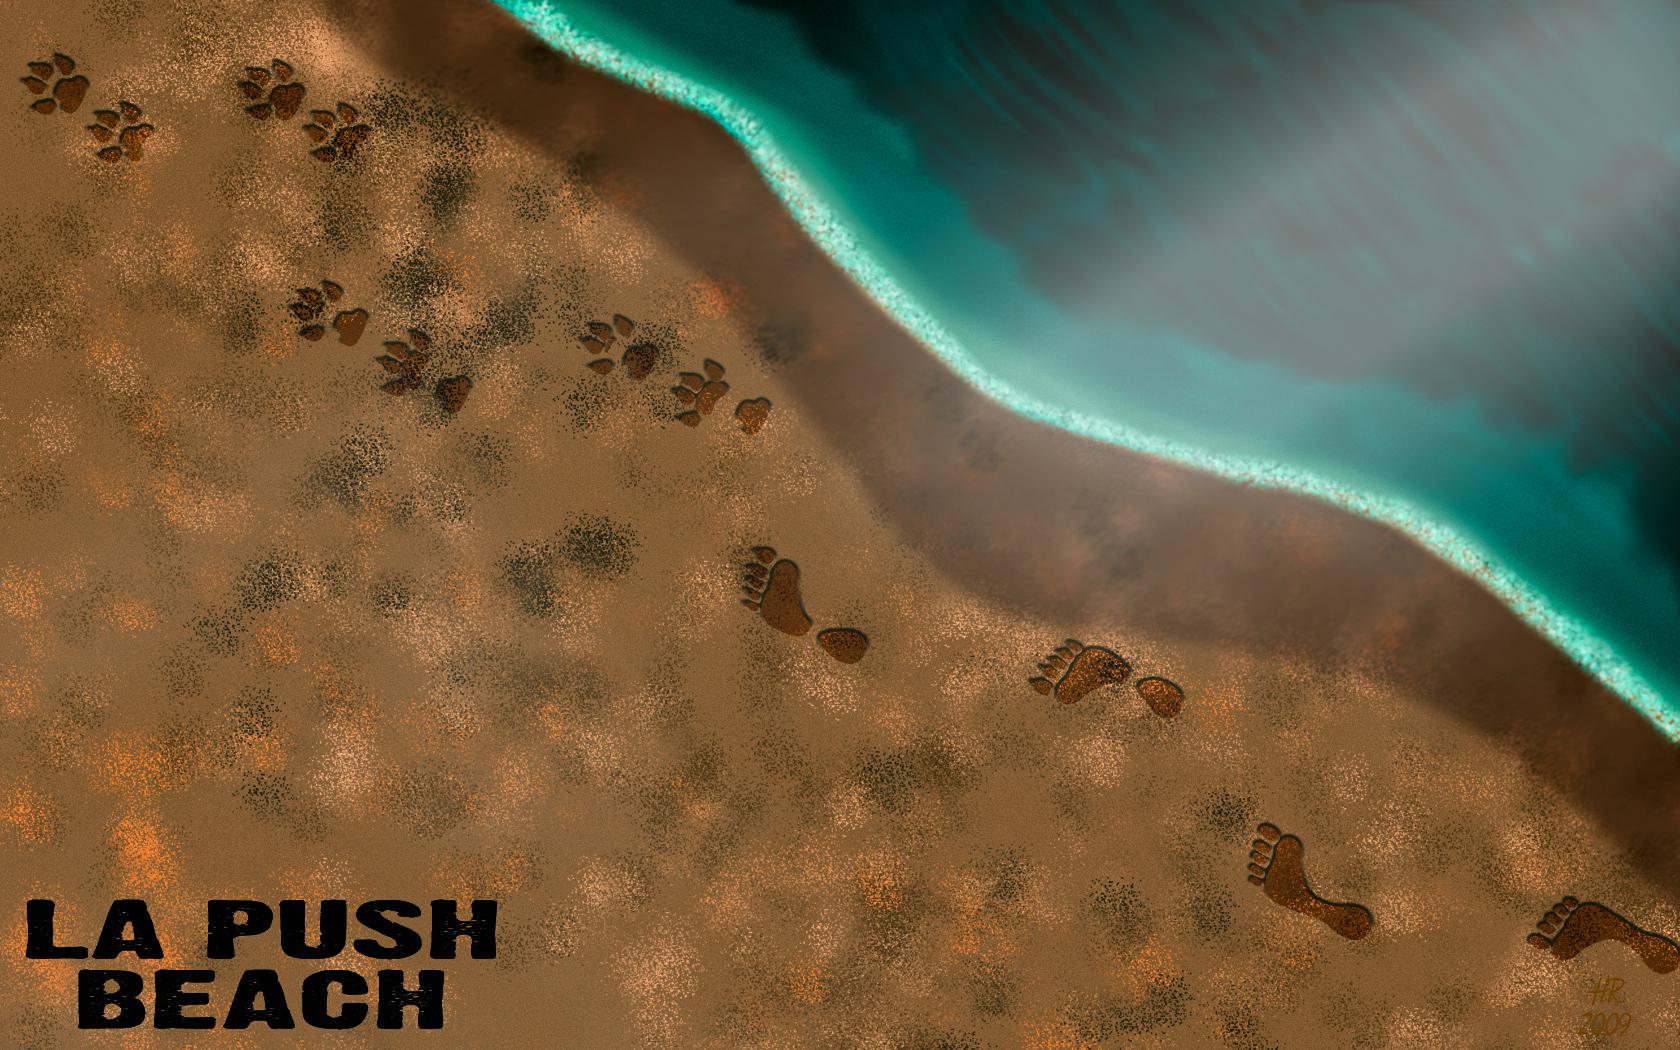 La Push strand